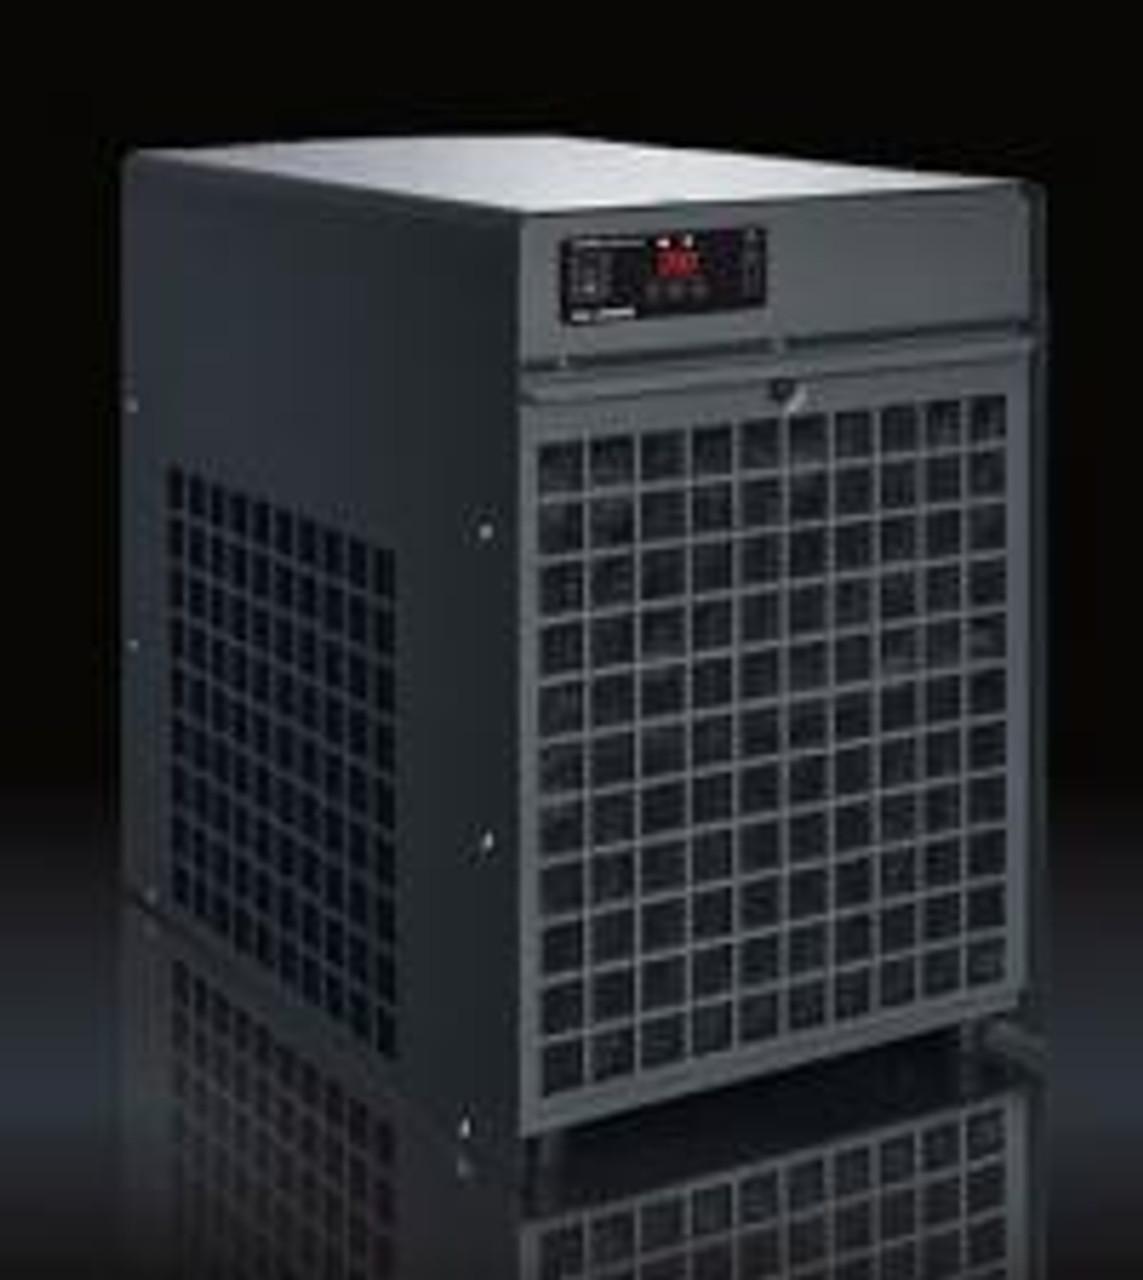 Teco TK3000 Aquarium Chiller to 3000 liters to 790 Gallons, 120VAC/1 Phase 60 Hz (TK 3000)